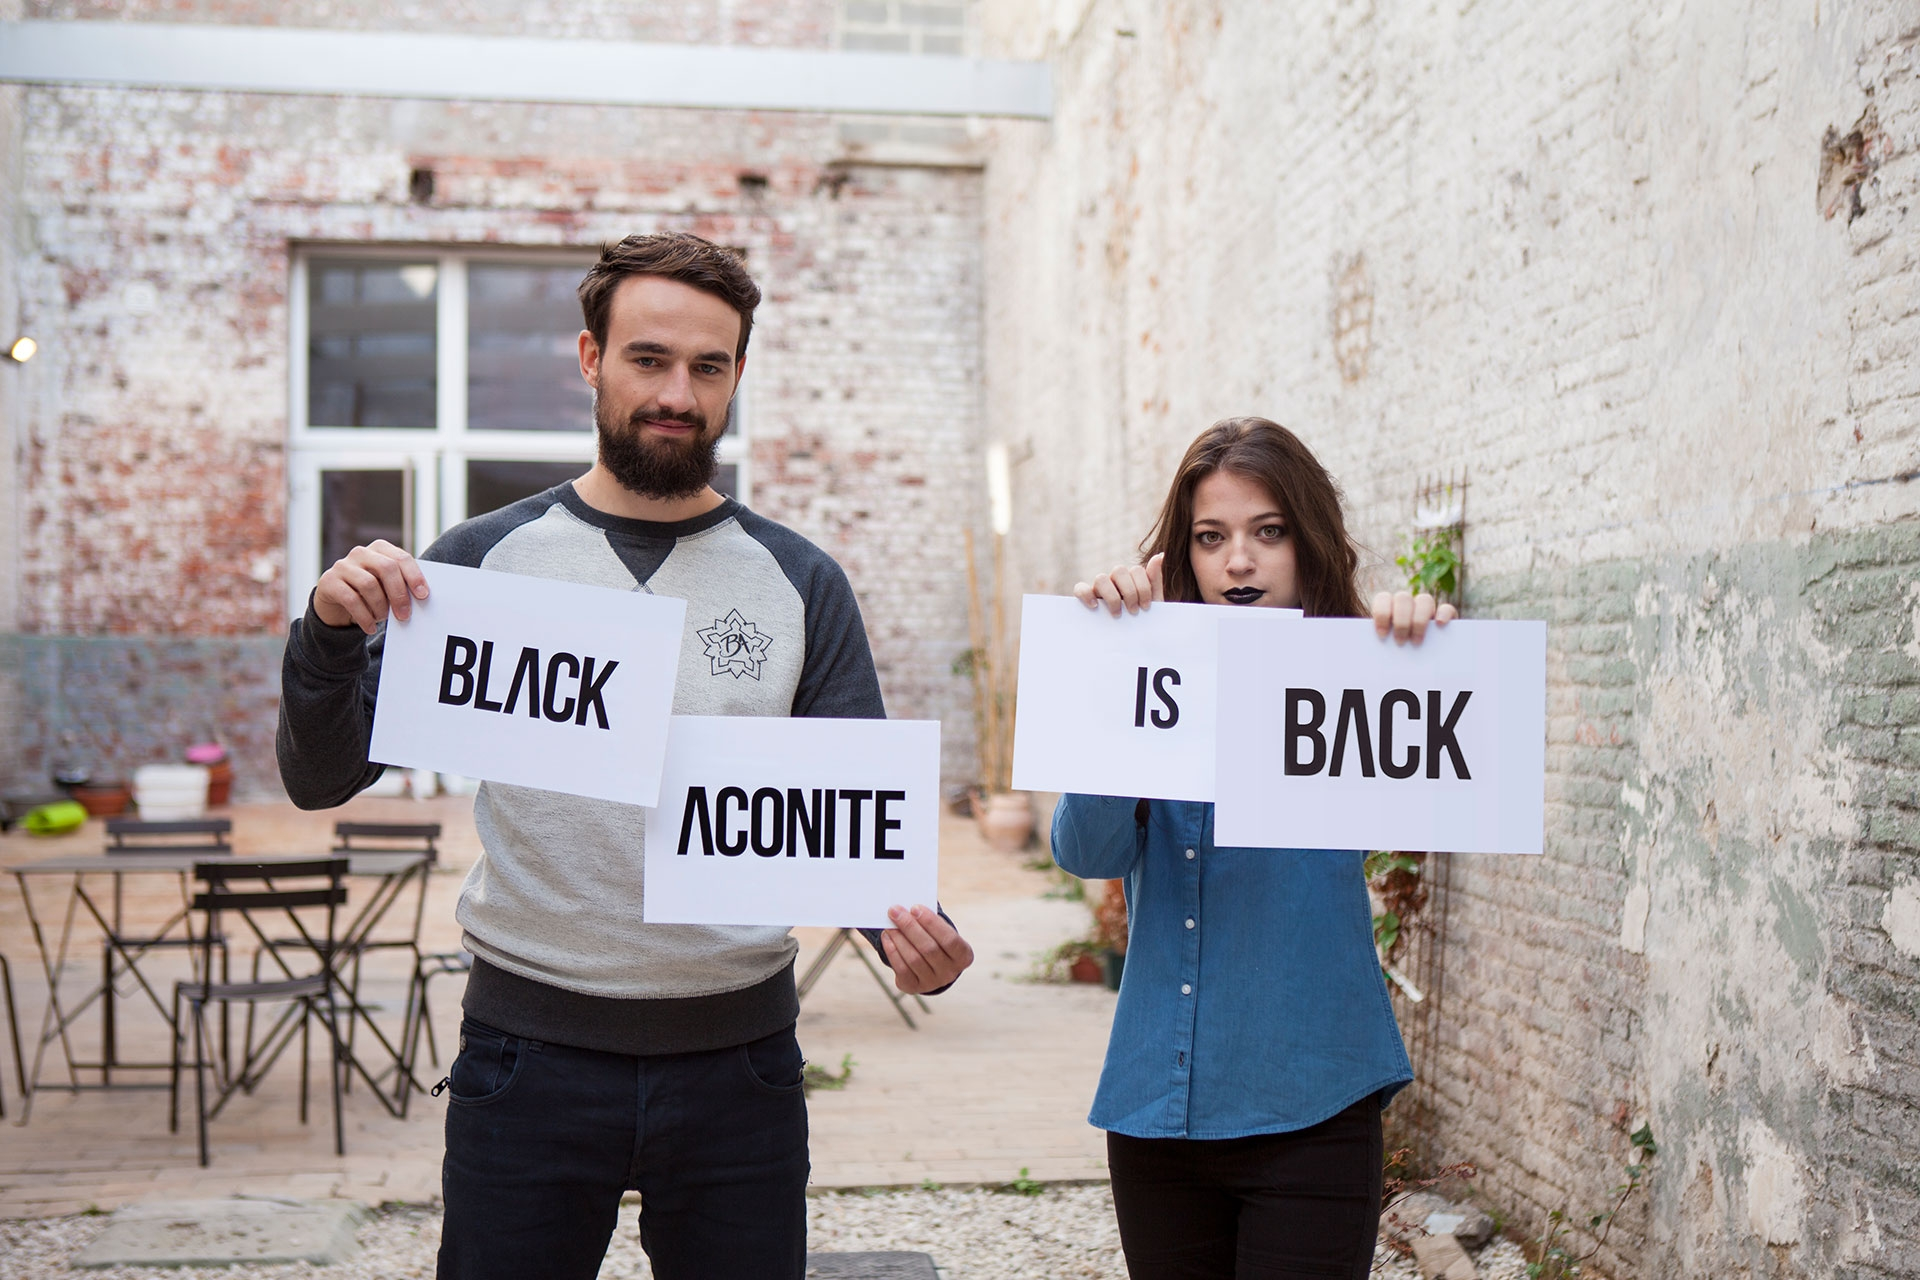 professionnels-photo-blackaconite-mountains-01